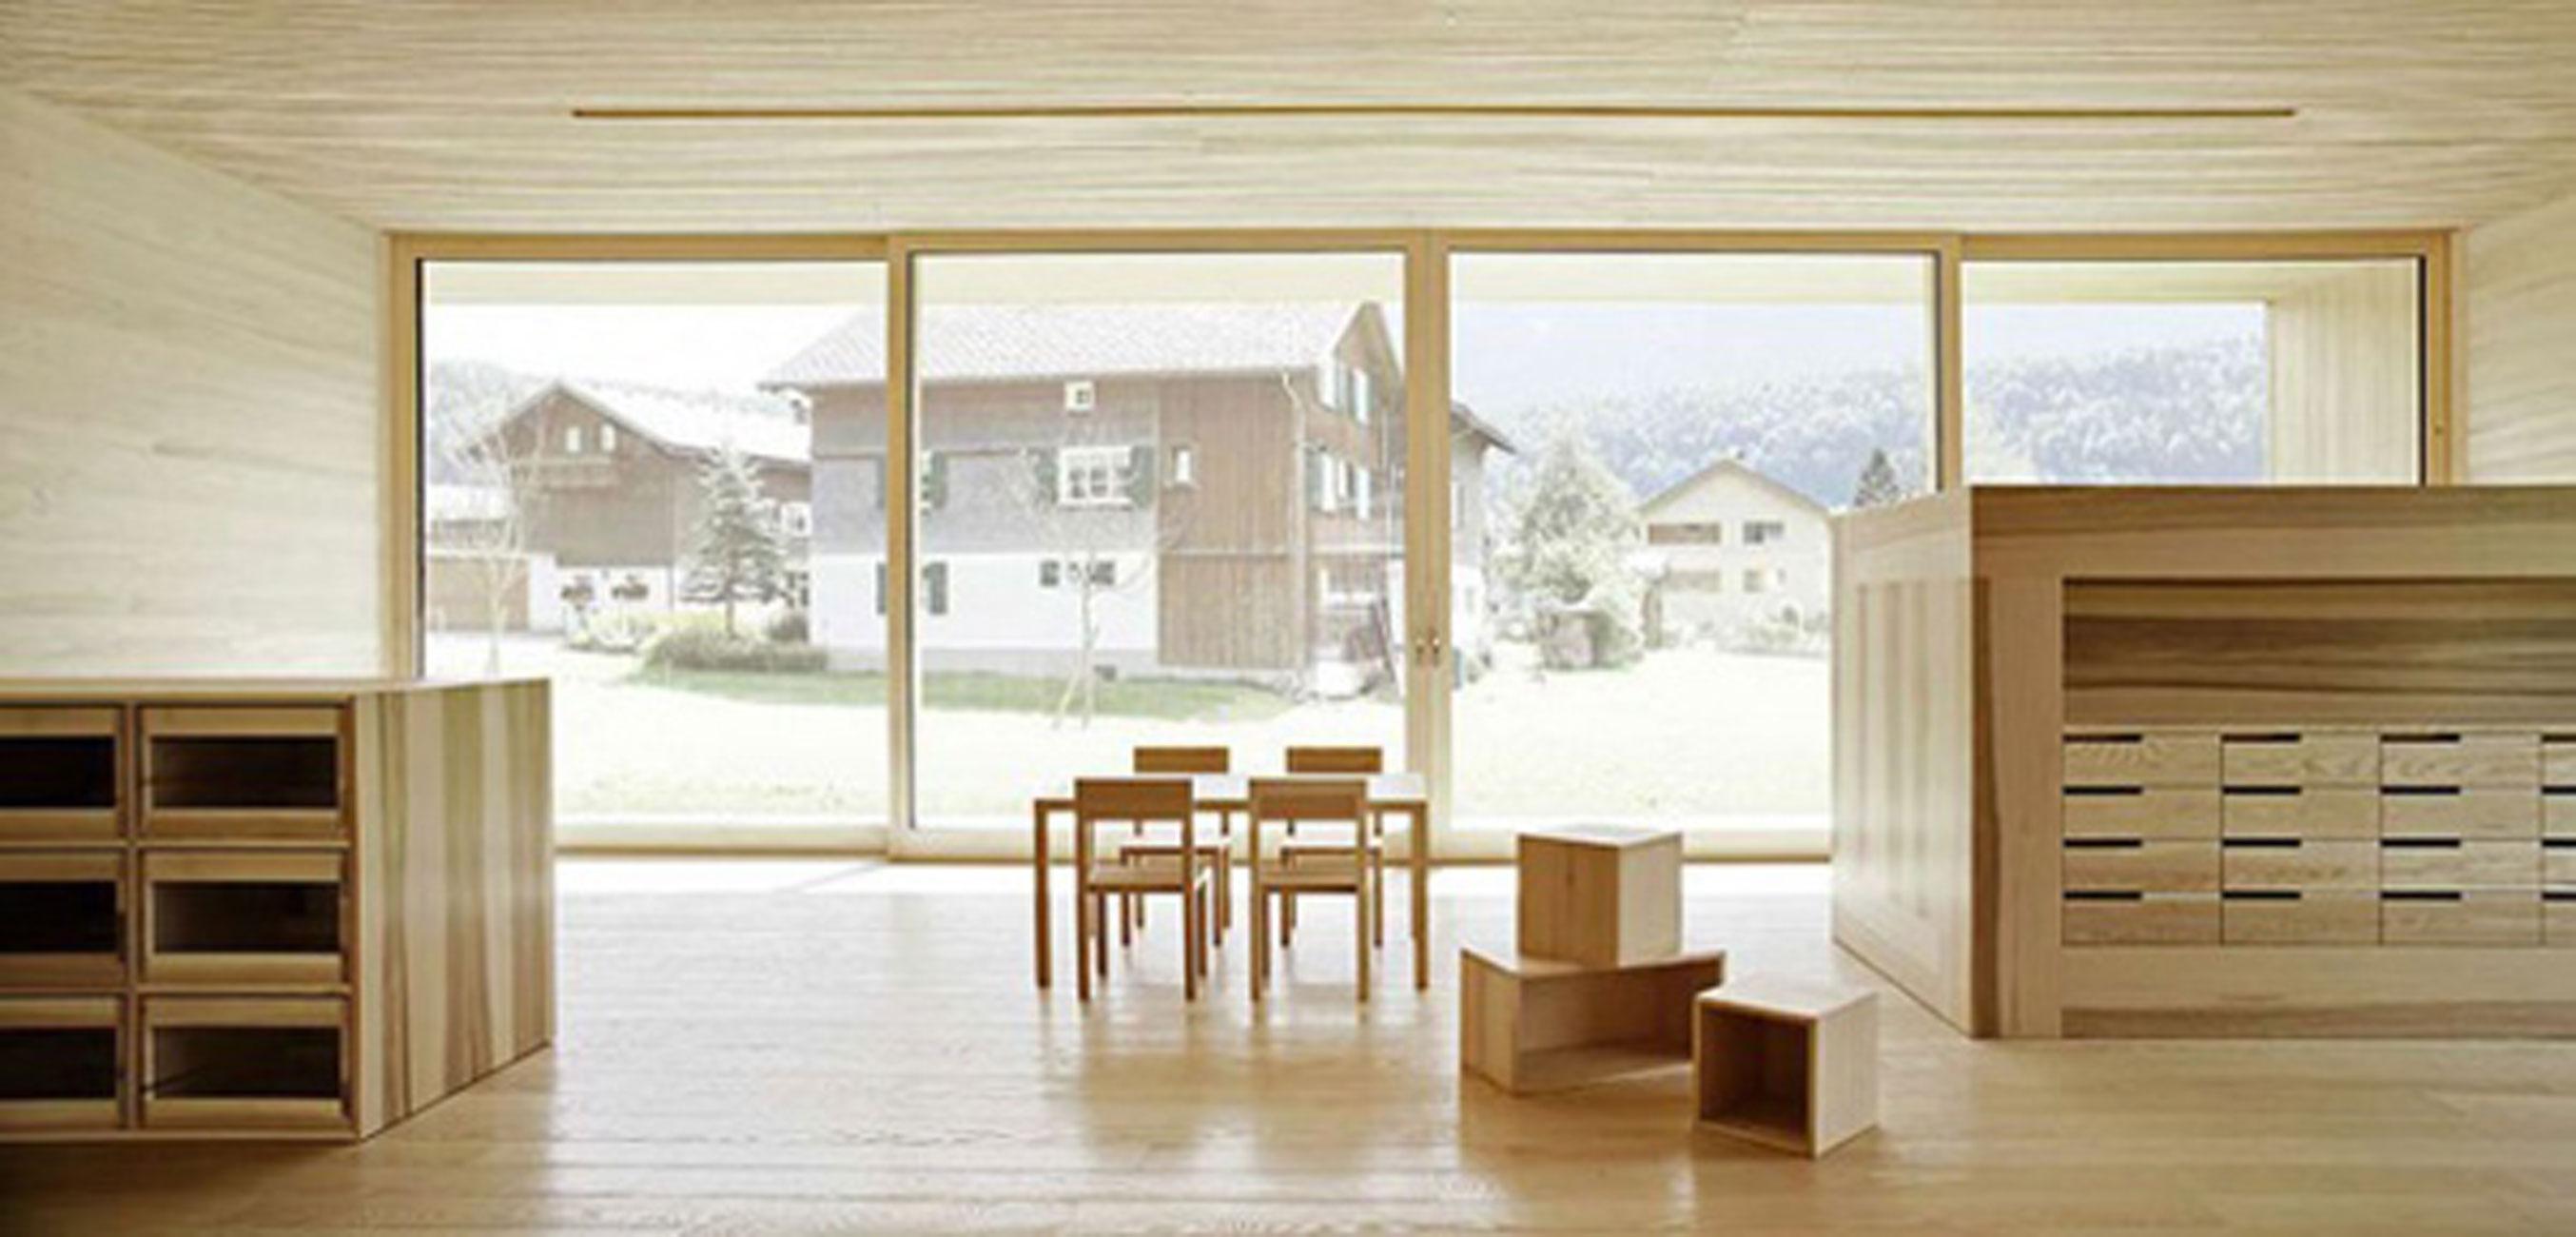 Minimalist Wooden House Ideas By Bernardo Bader Interior